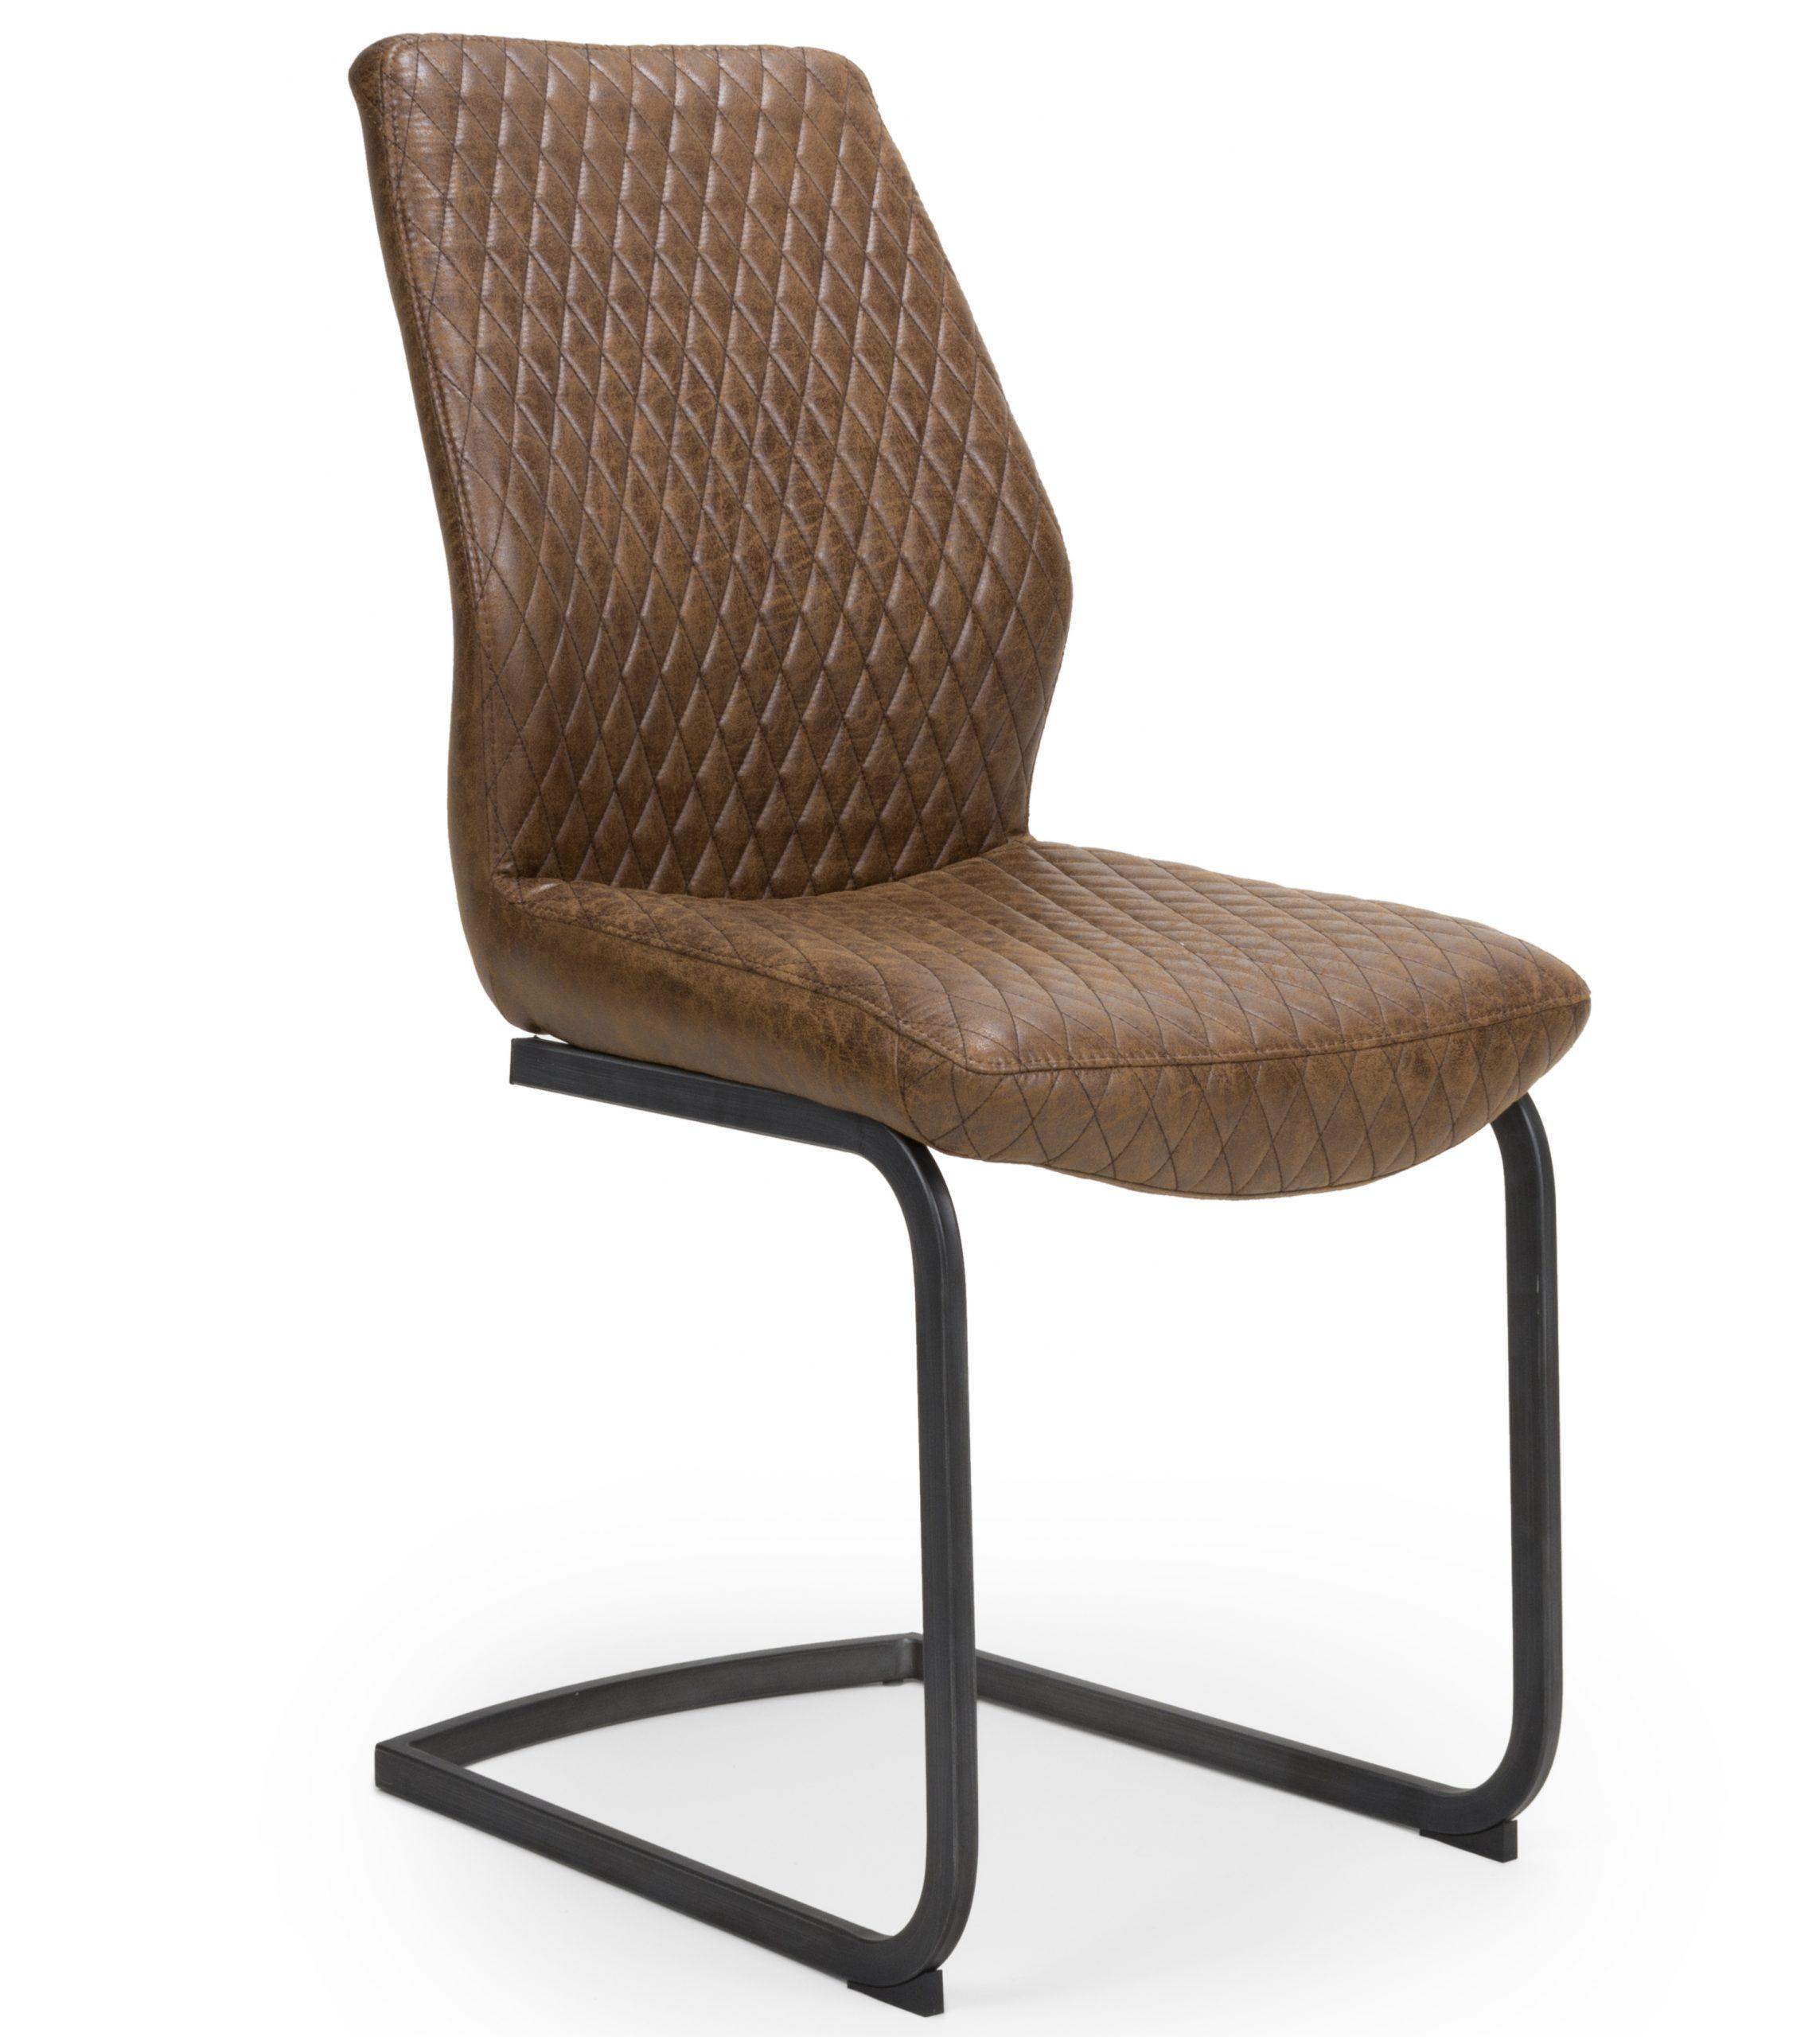 Harley Vintage brown leather dining chair